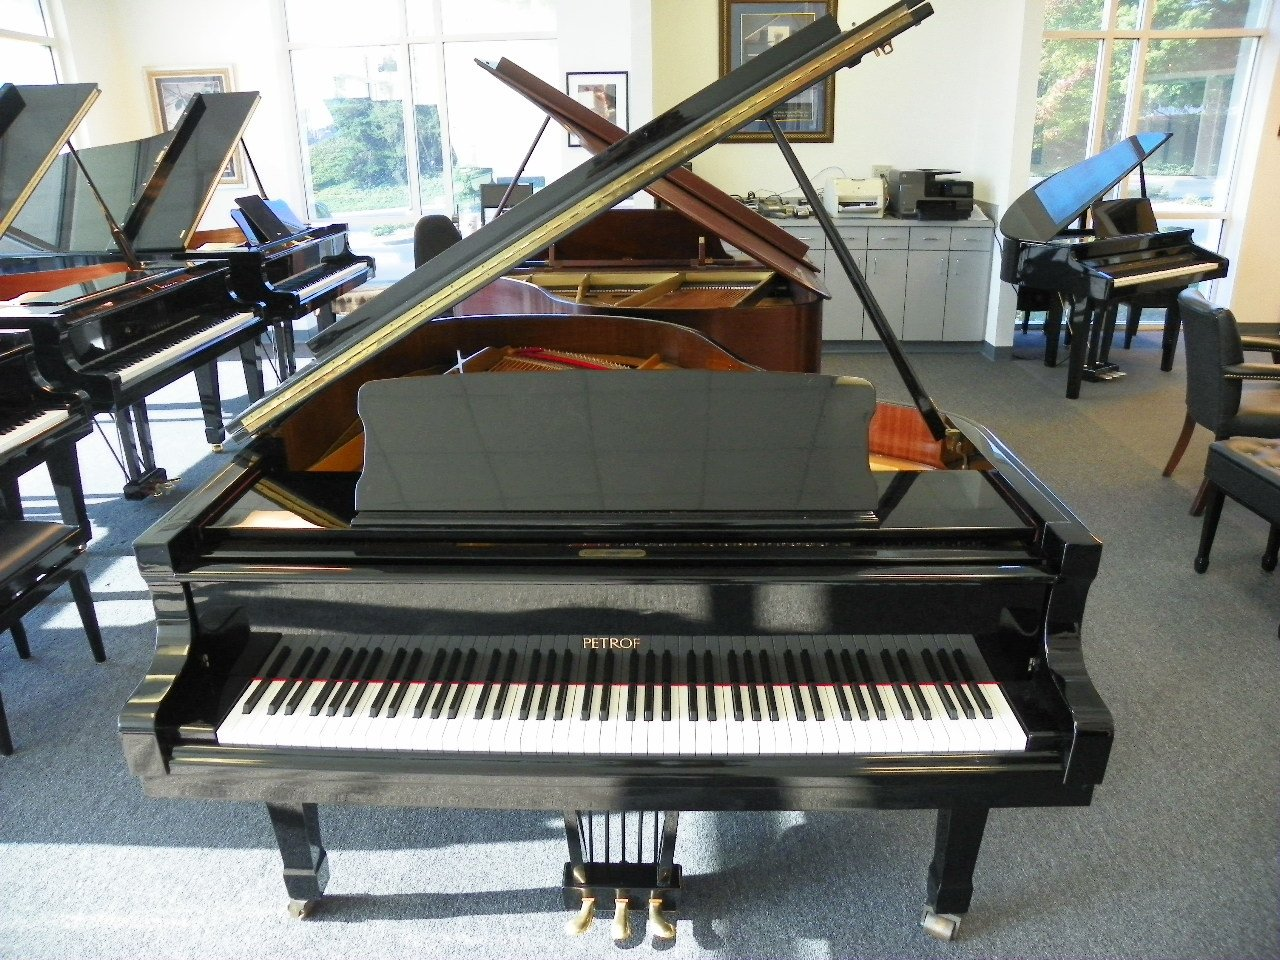 Petrof Piano | England Piano